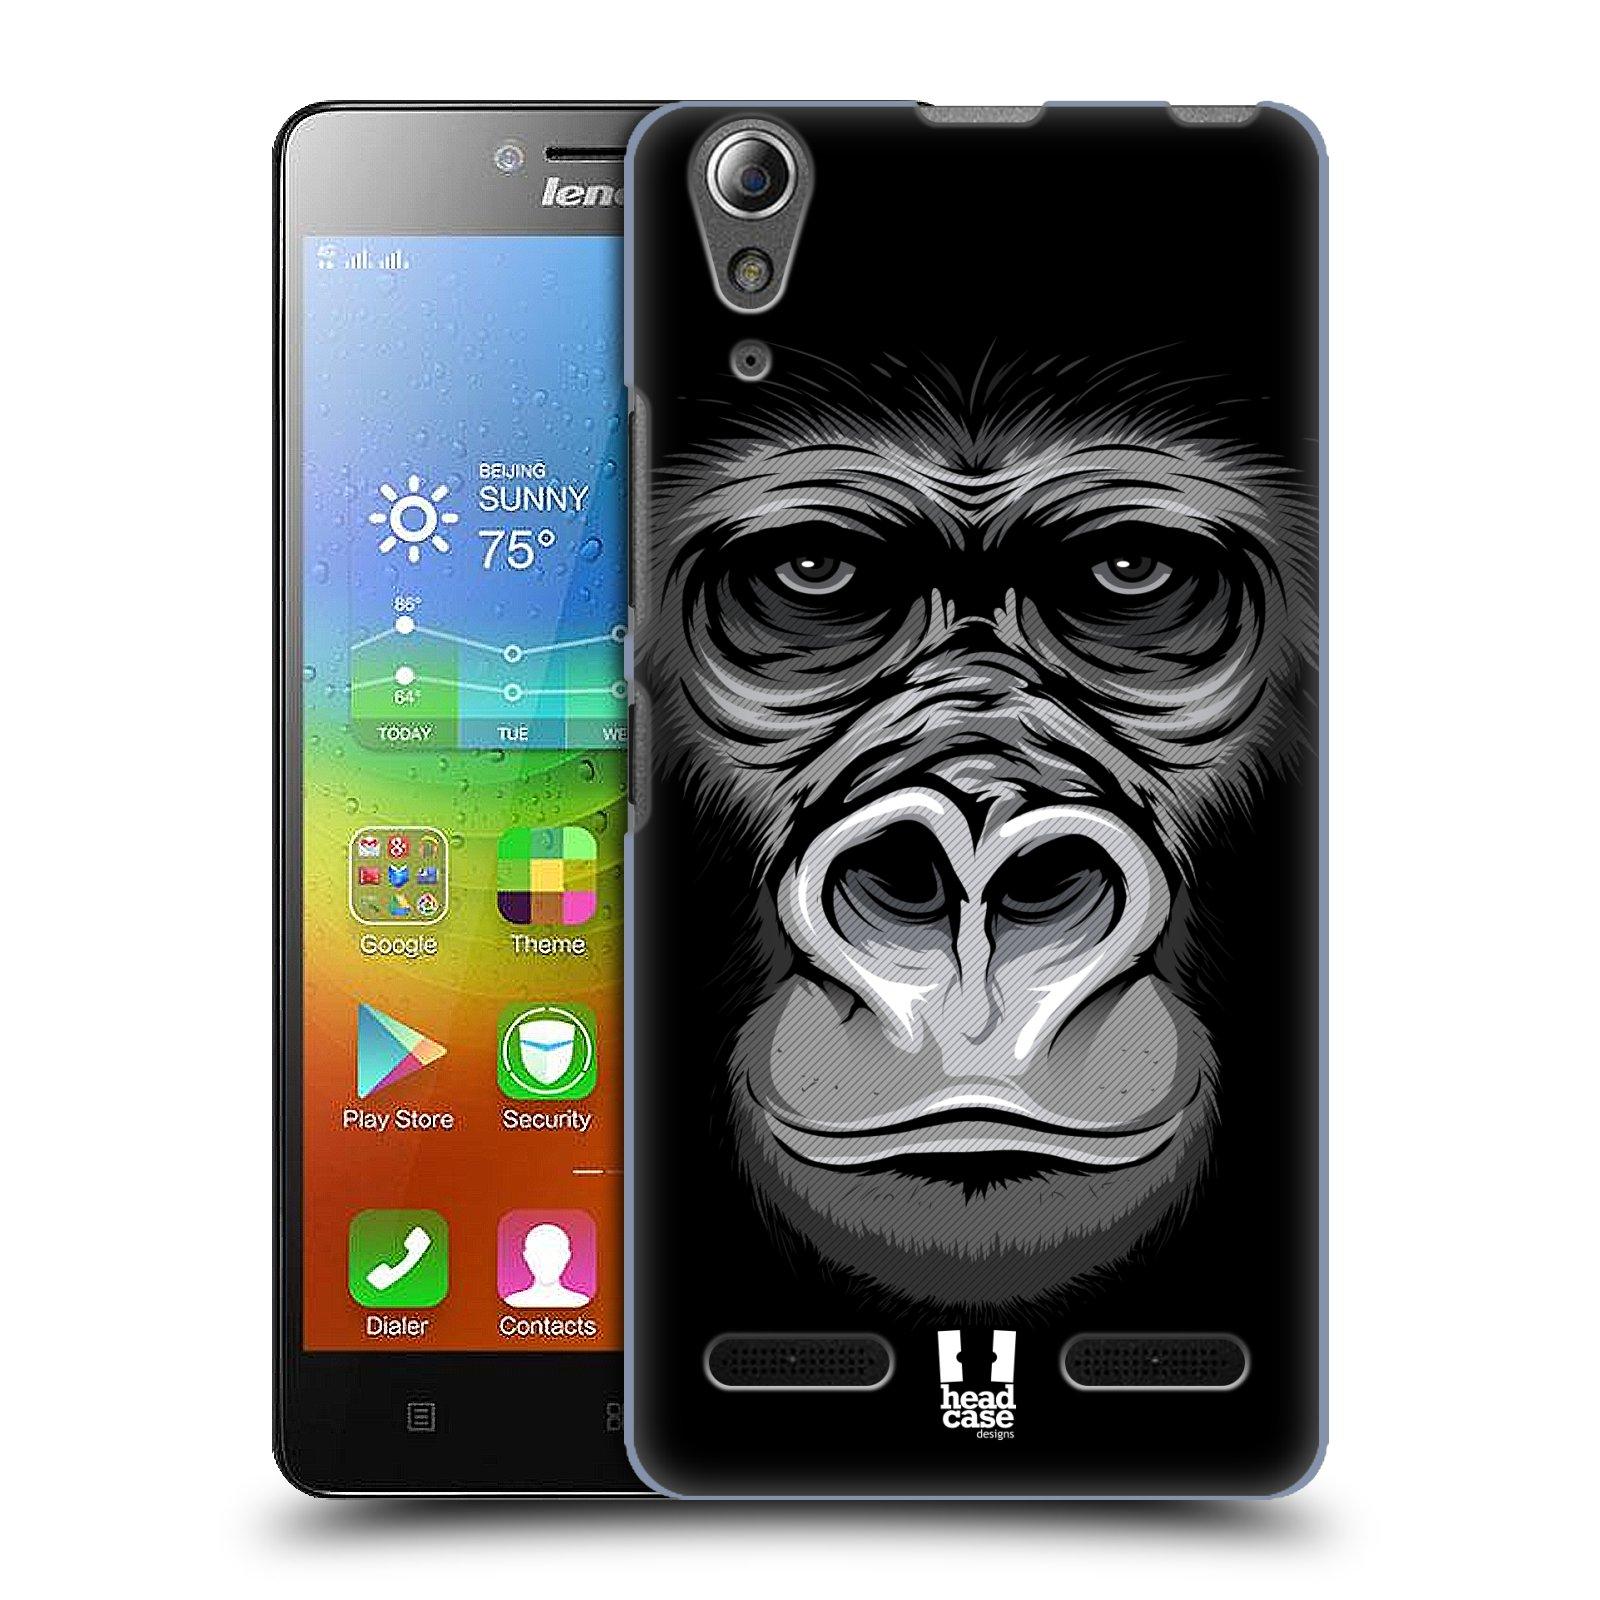 HEAD CASE pevný plastový obal na mobil LENOVO A6000 / A6000 PLUS vzor Zvíře kreslená tvář 2 gorila